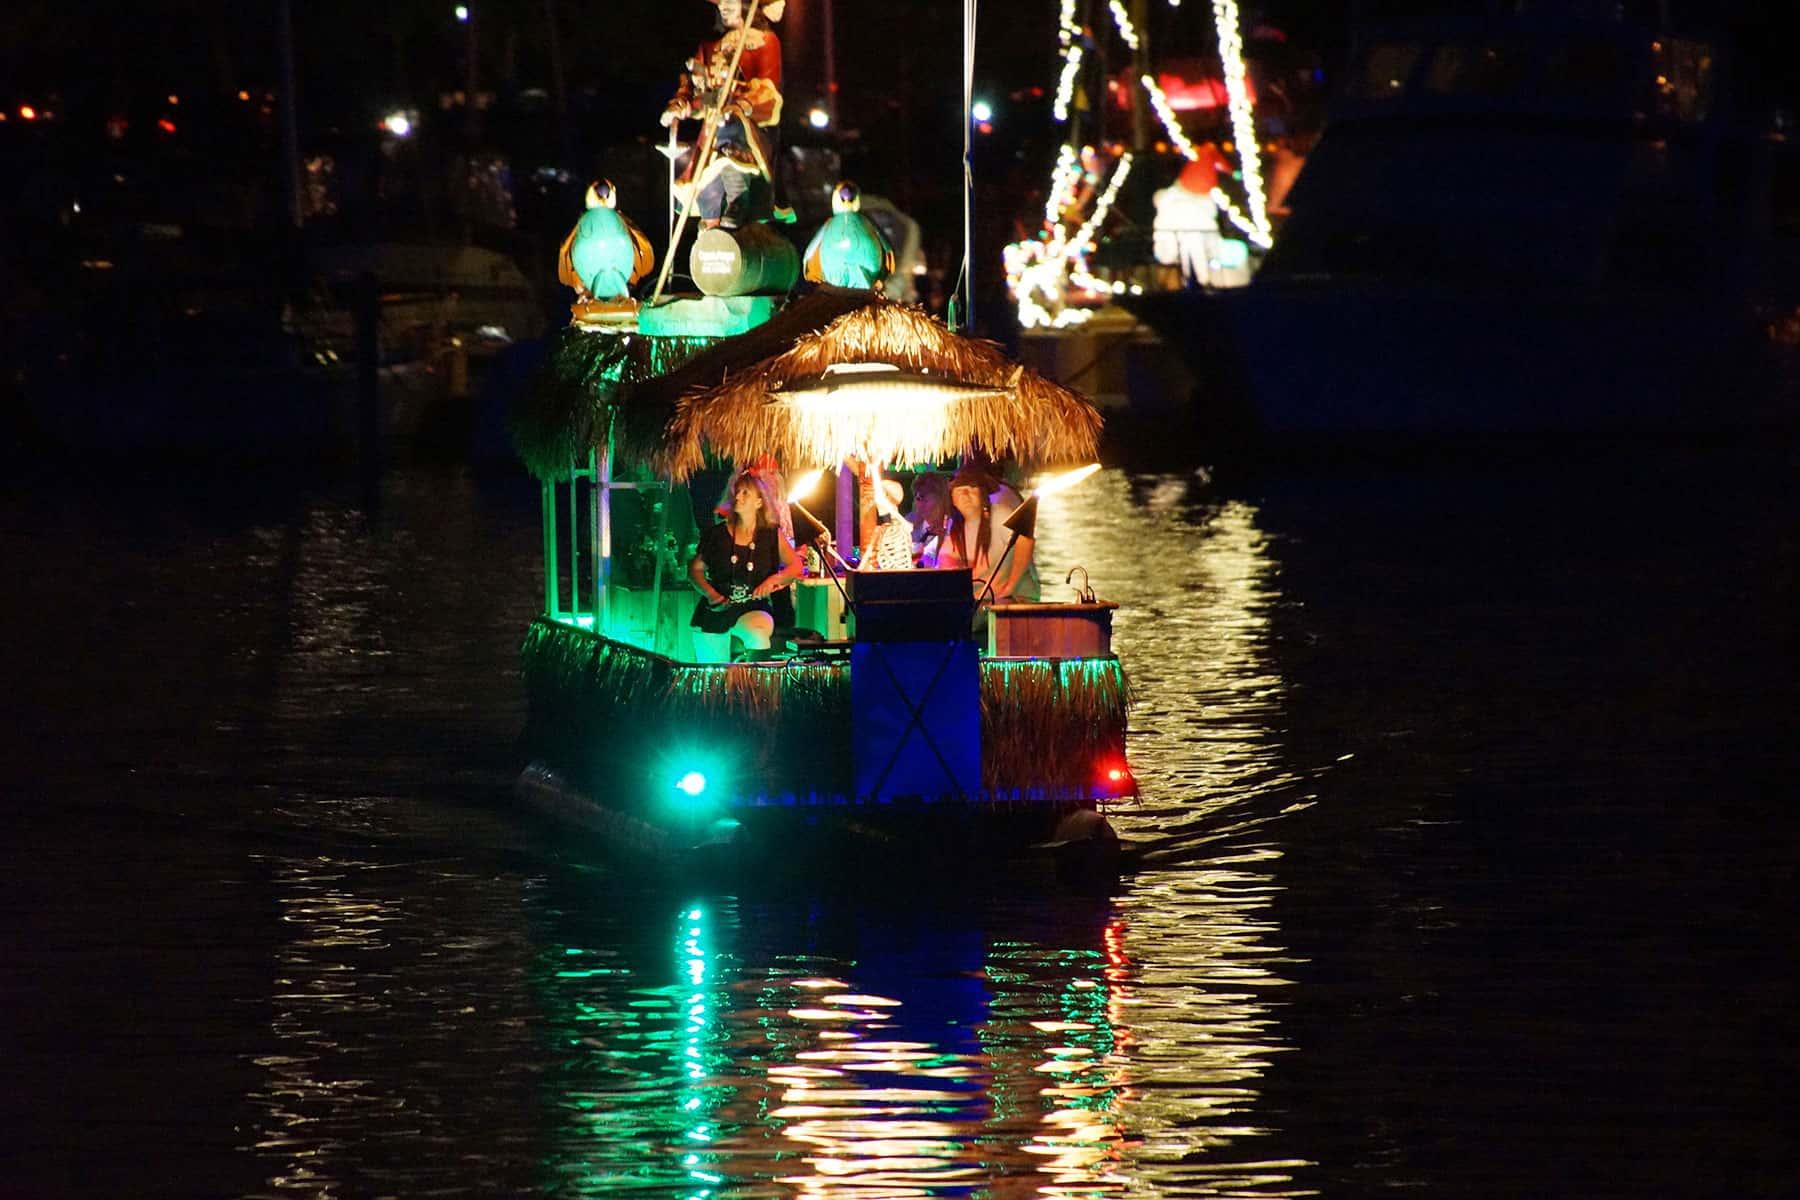 02_081917_venetianboatparade_698